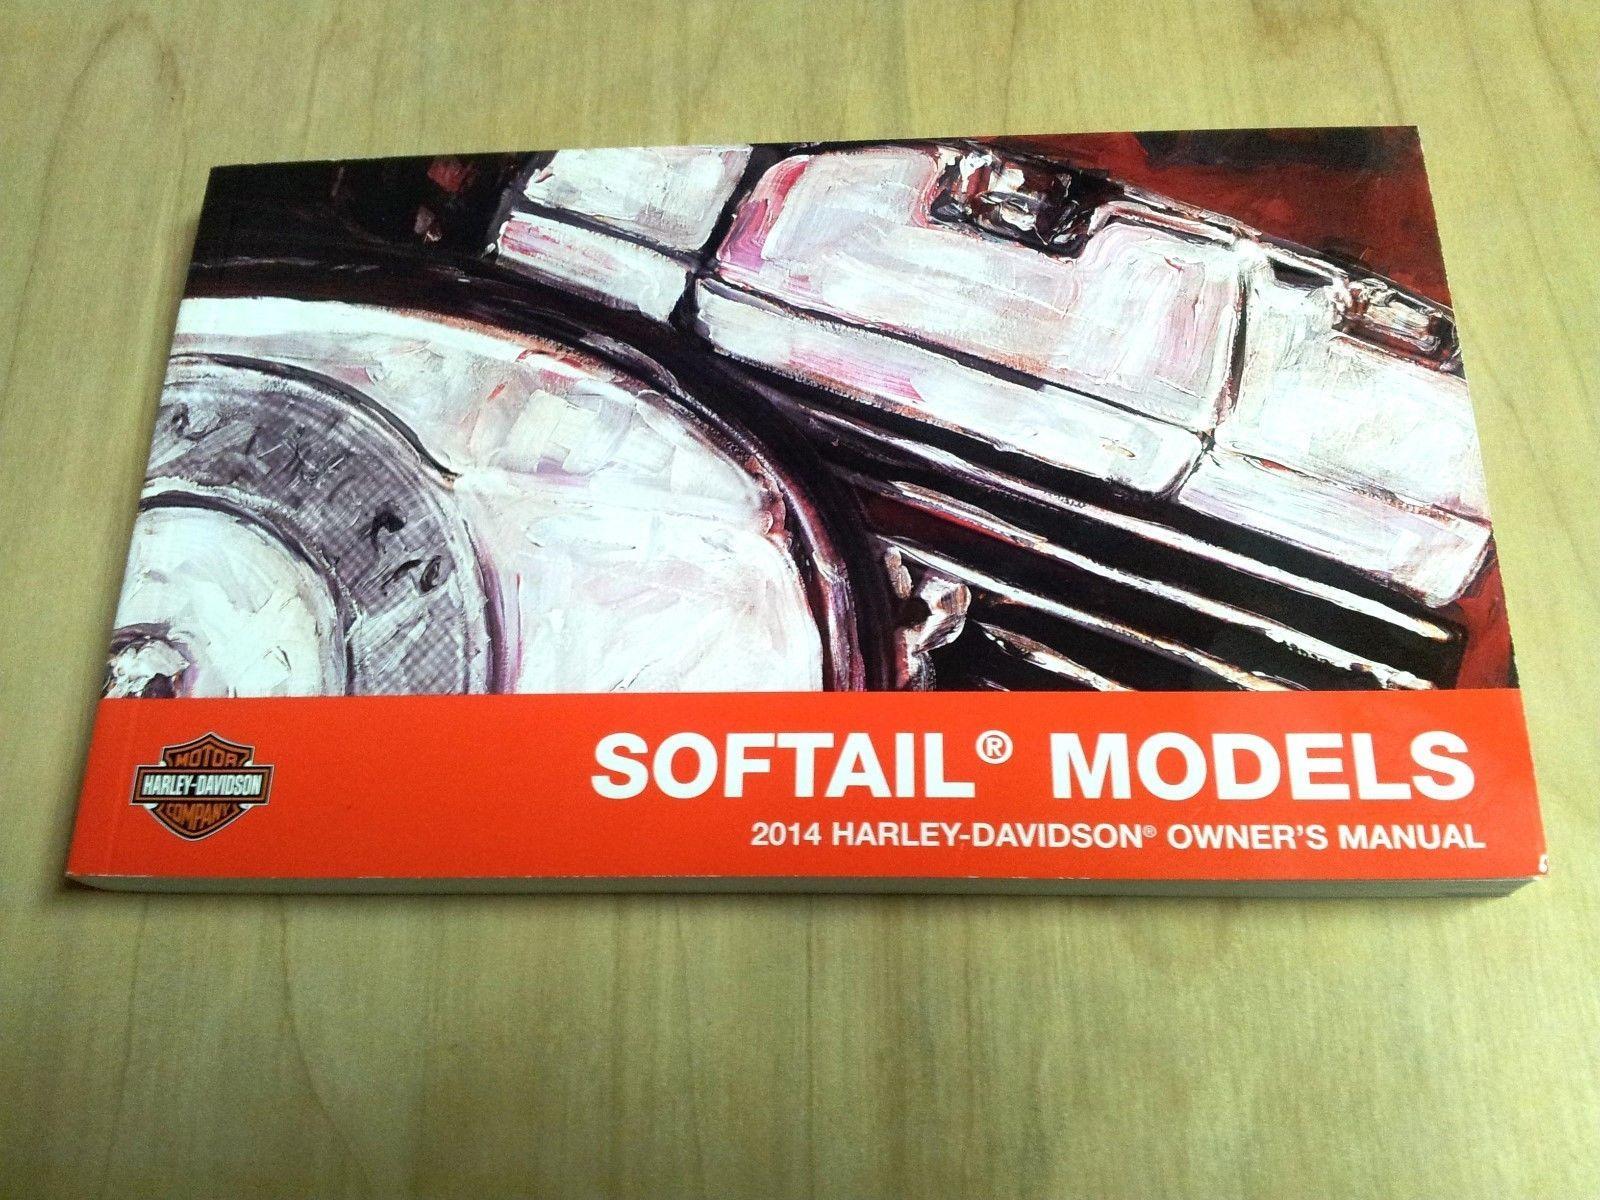 2014 Harley Davidson USED Softail Models Owner's Manual 99469-14